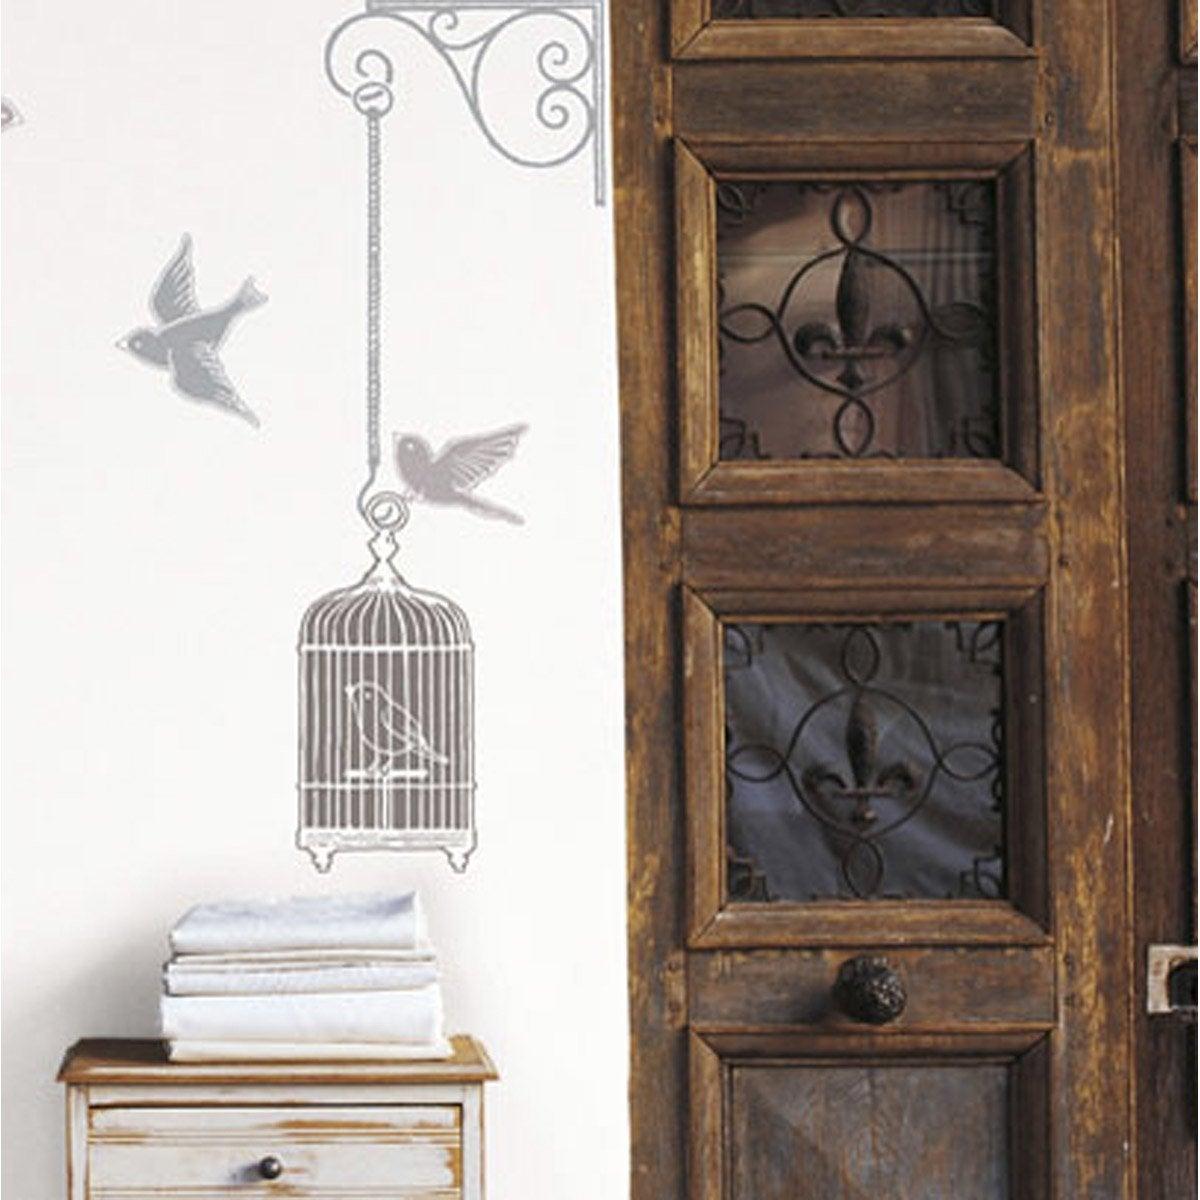 Sticker cages blanches et oiseaux 49 cm x 69 cm leroy merlin - Stickers escalier leroy merlin ...